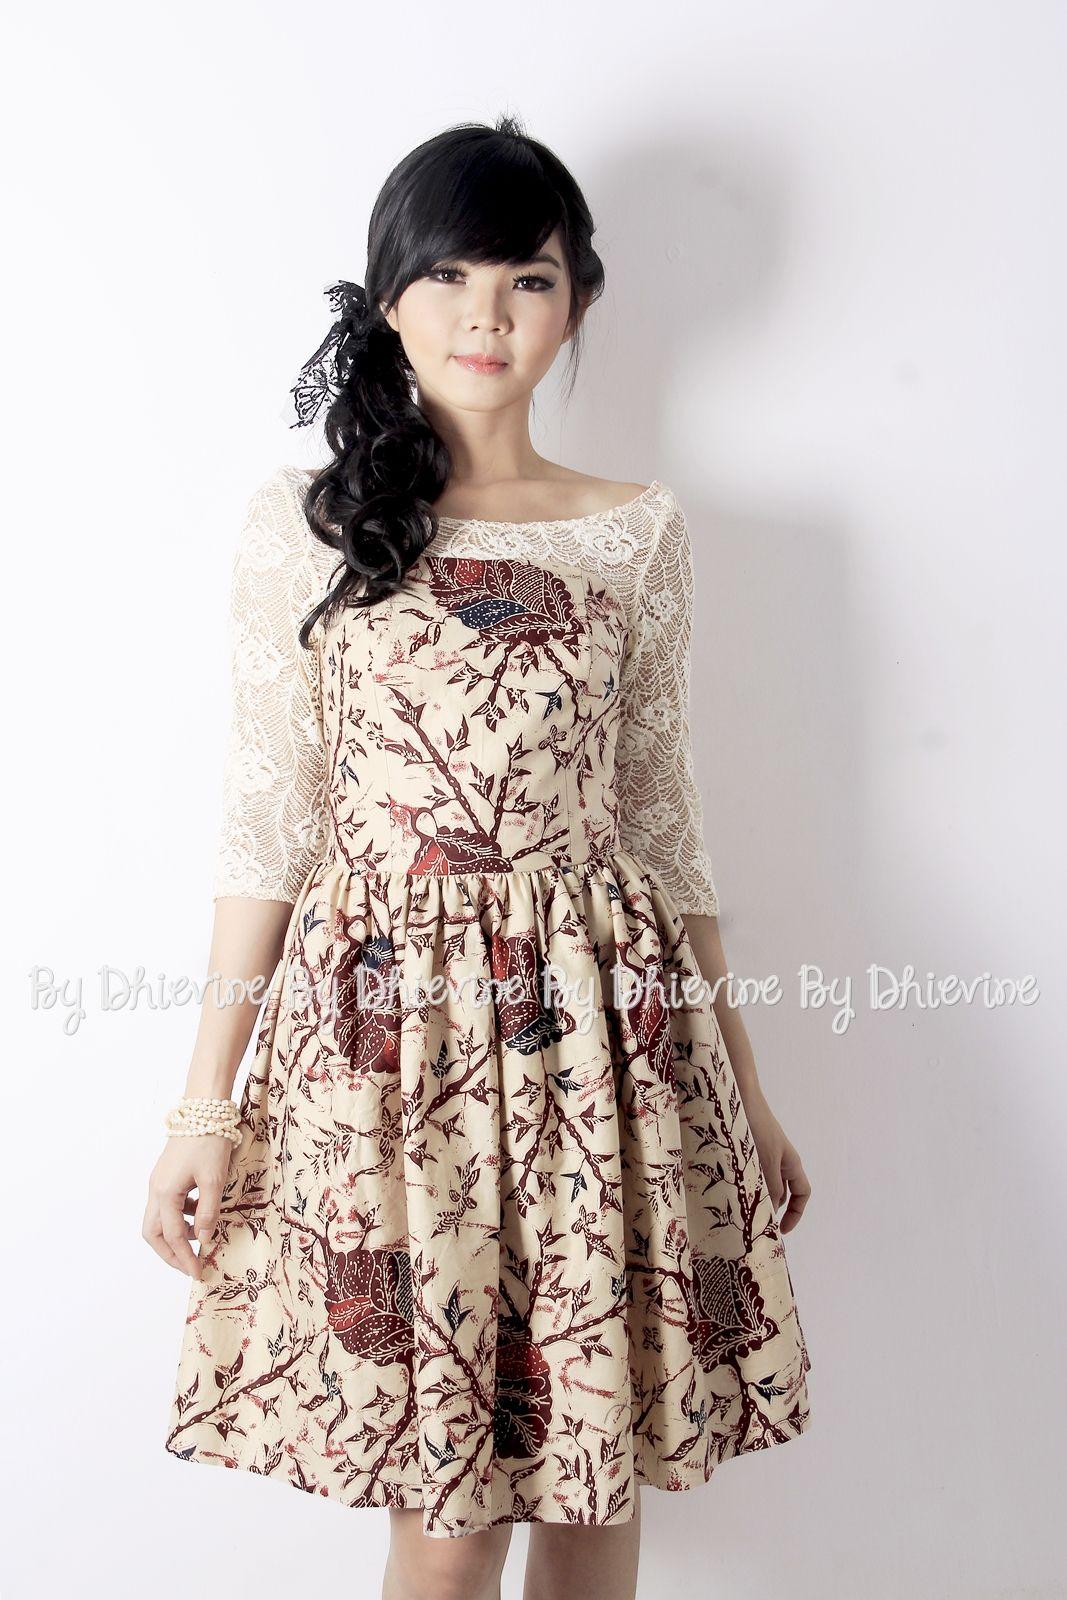 Batik dress | Kebaya Dress | Pendapa Batik Brown Dress | DhieVine | Redefine You